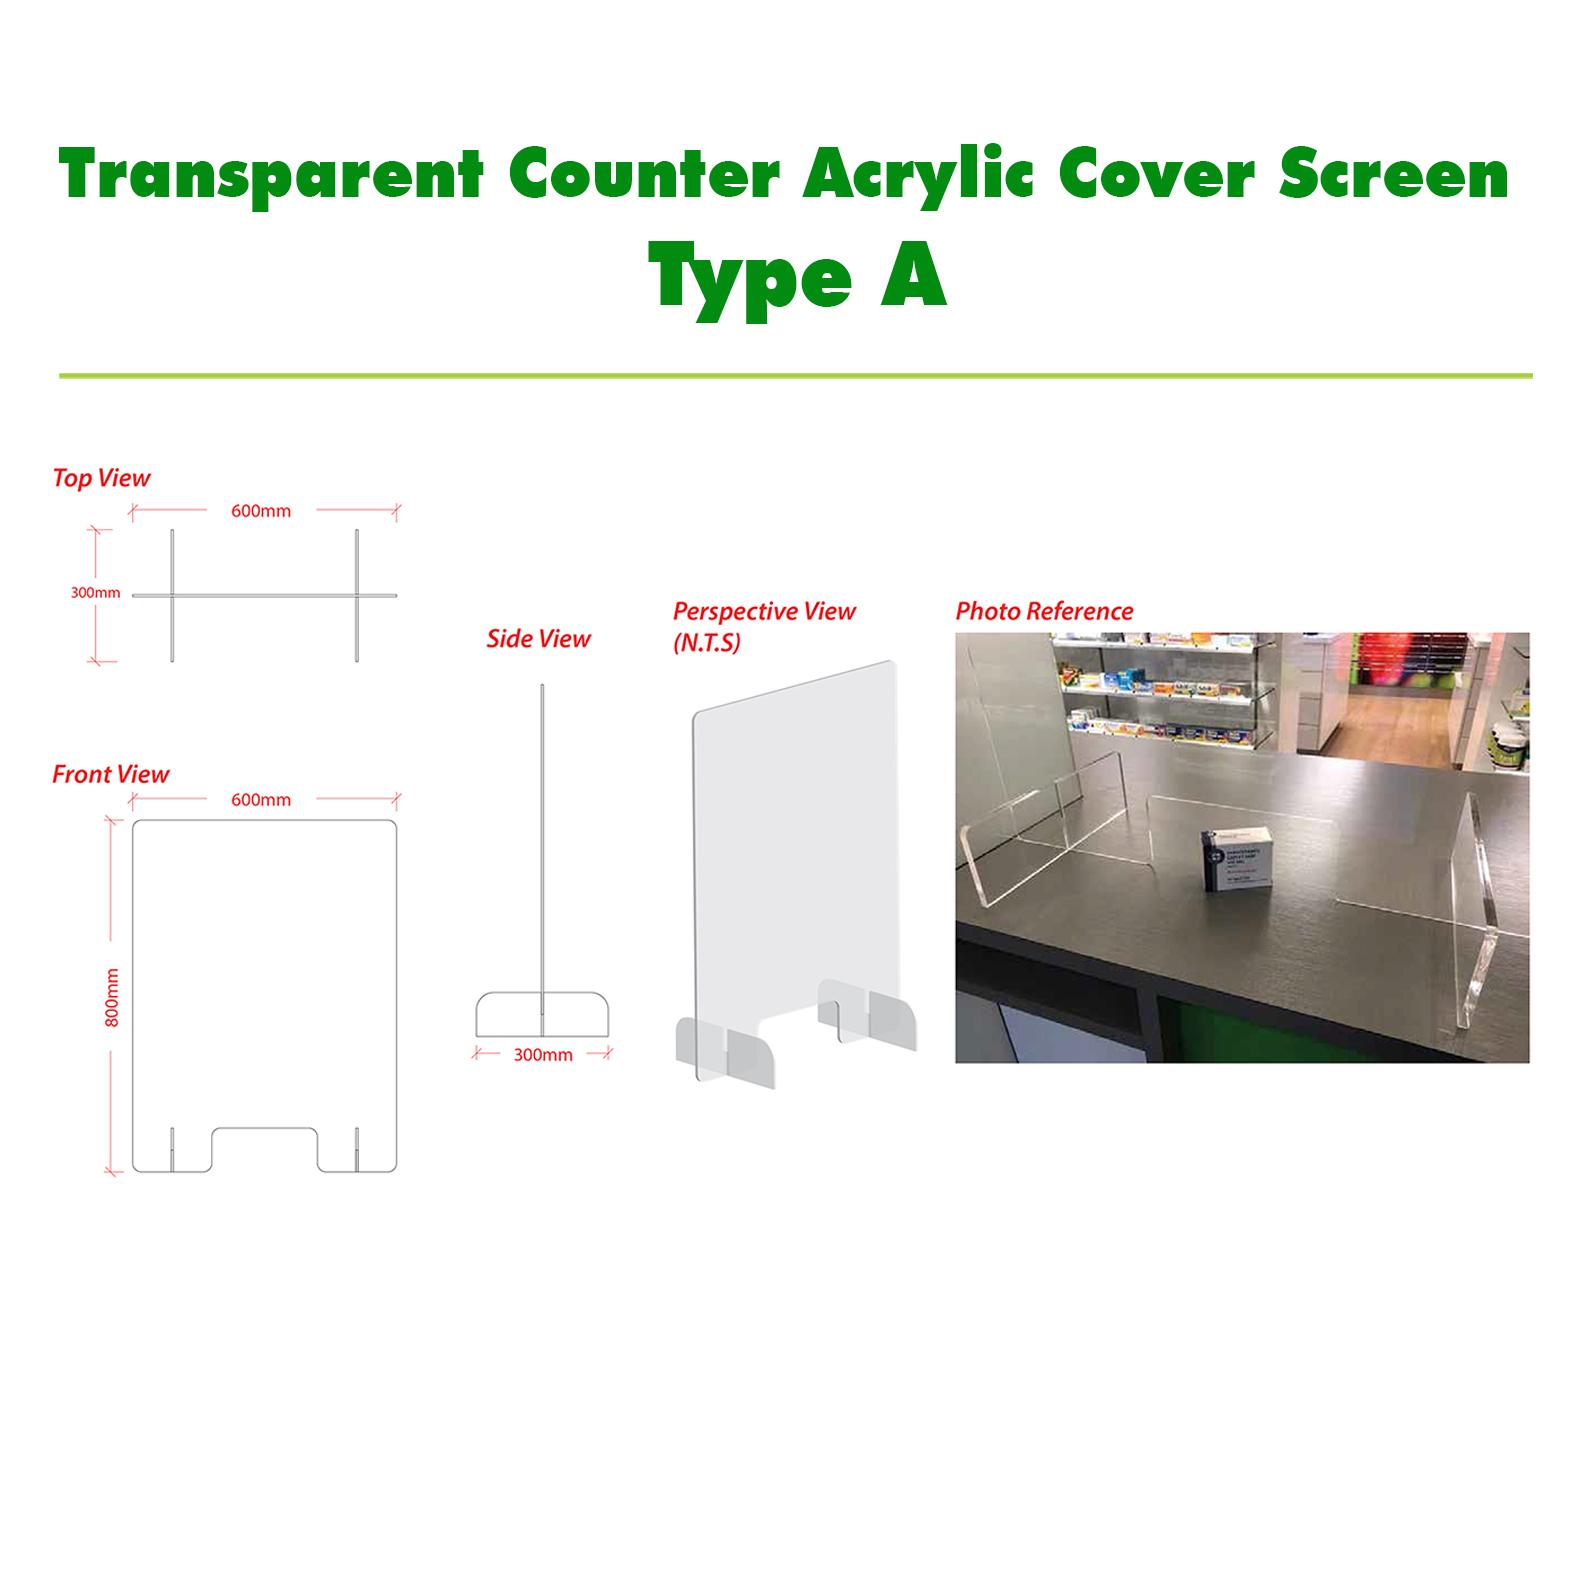 Transparent Counter Acrylic Cover Screen